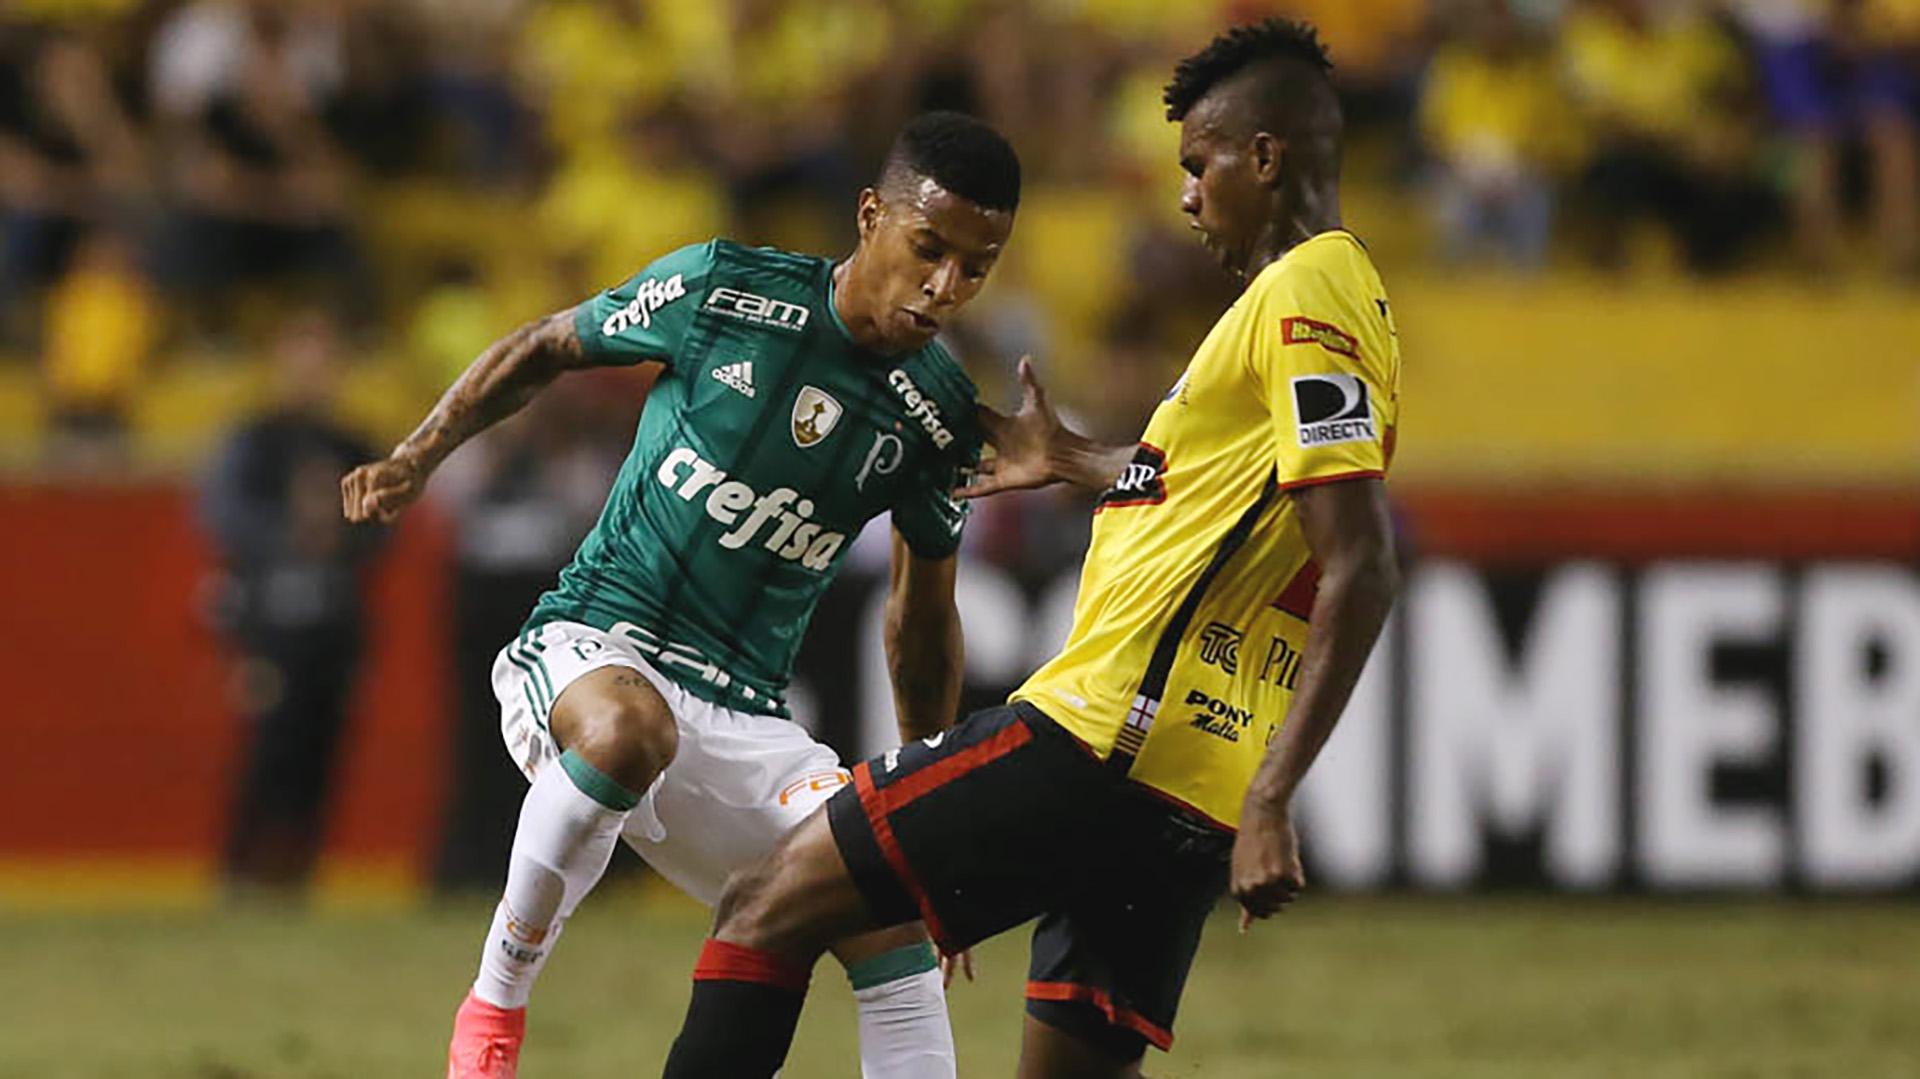 Danilo Tche Tche Barcelona Guayaquil Palmeiras Libertadores 05072017